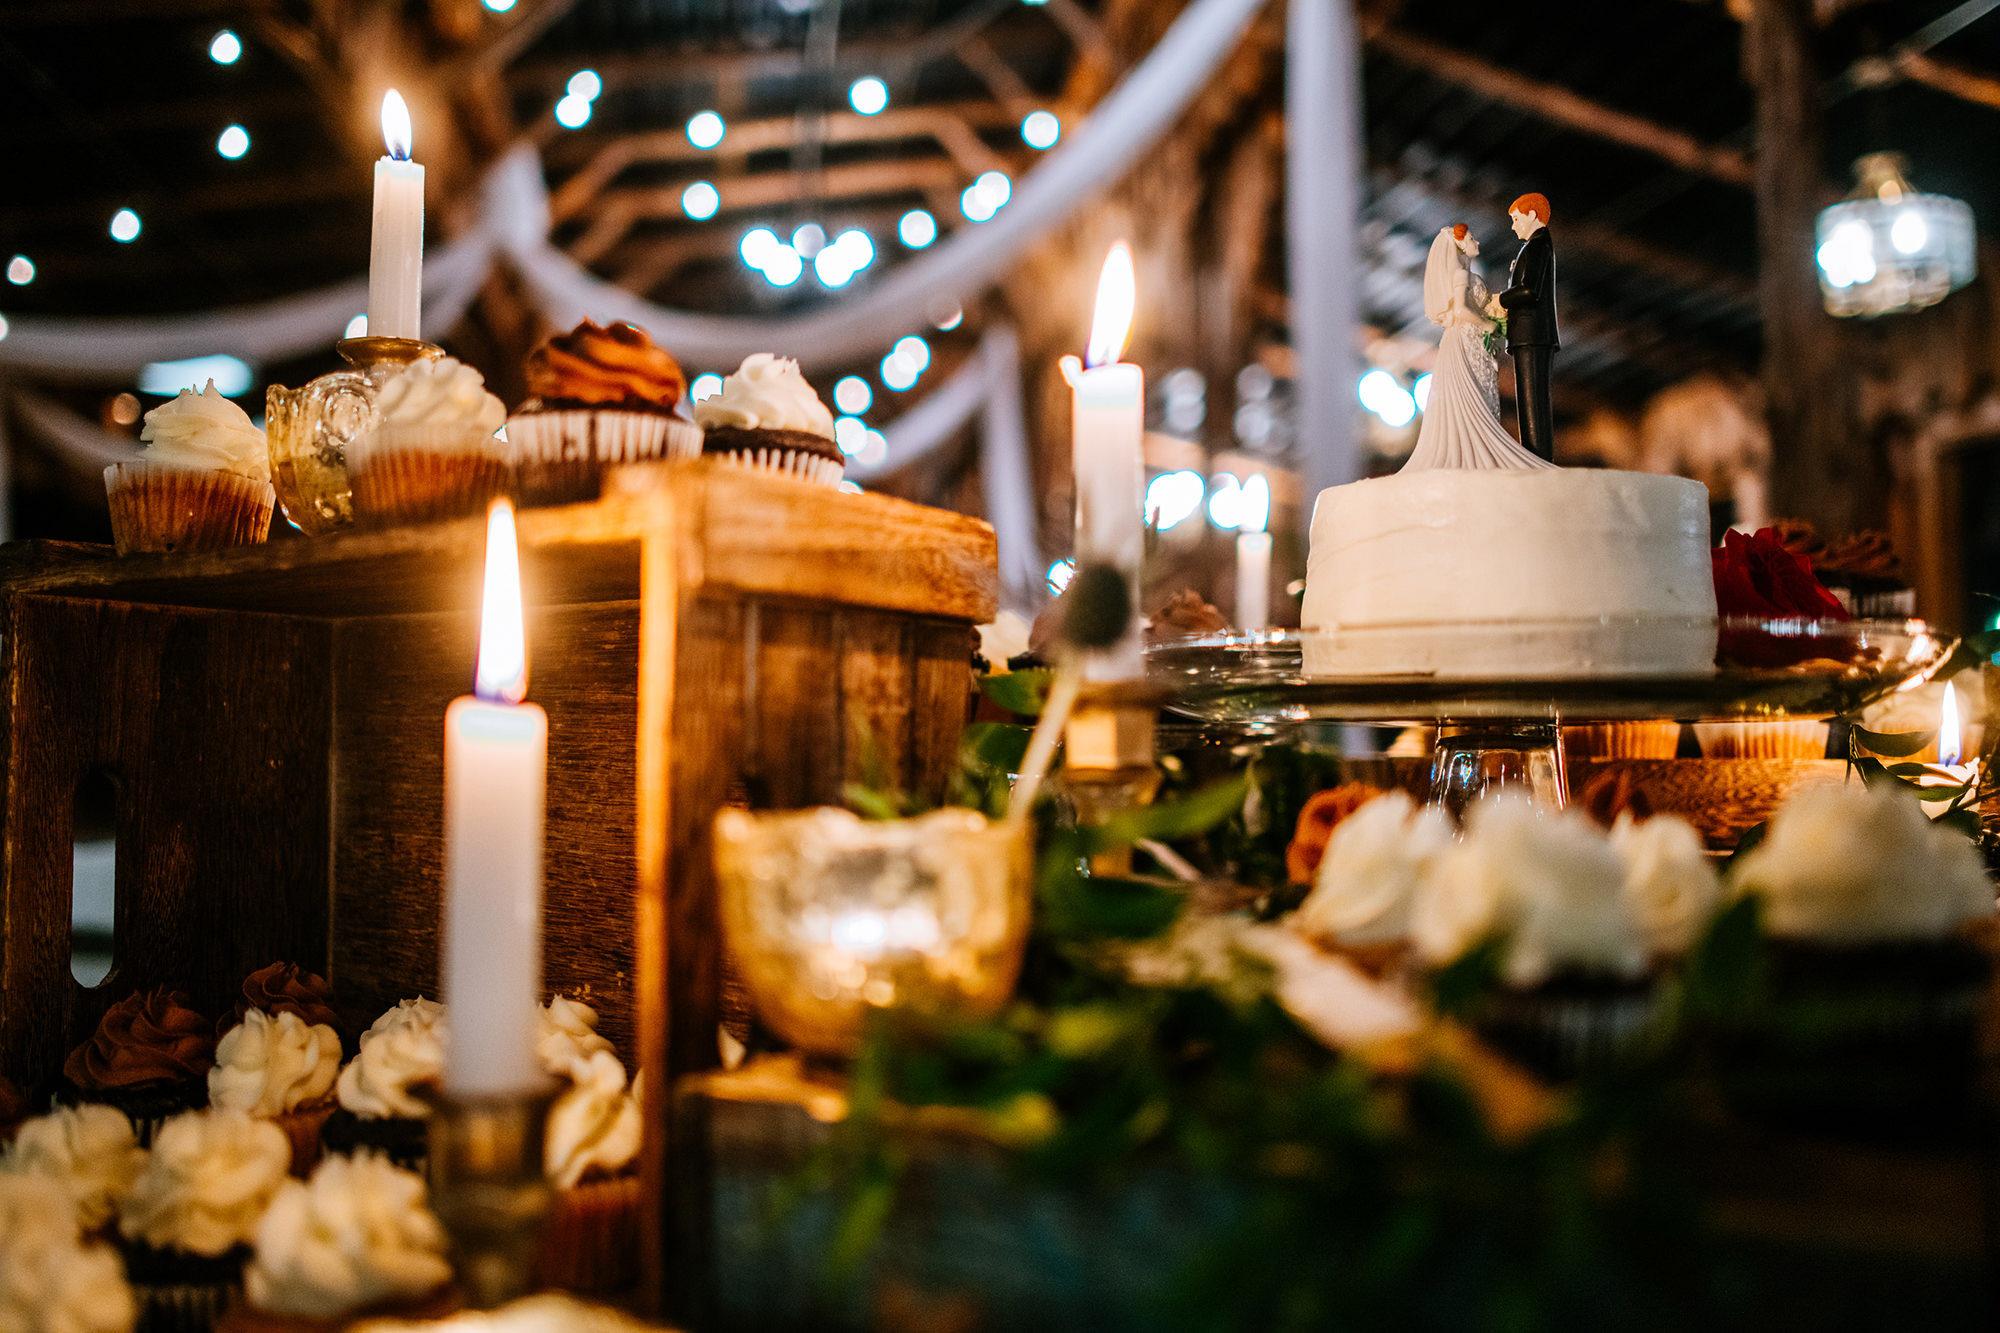 wild muffin wedding cake